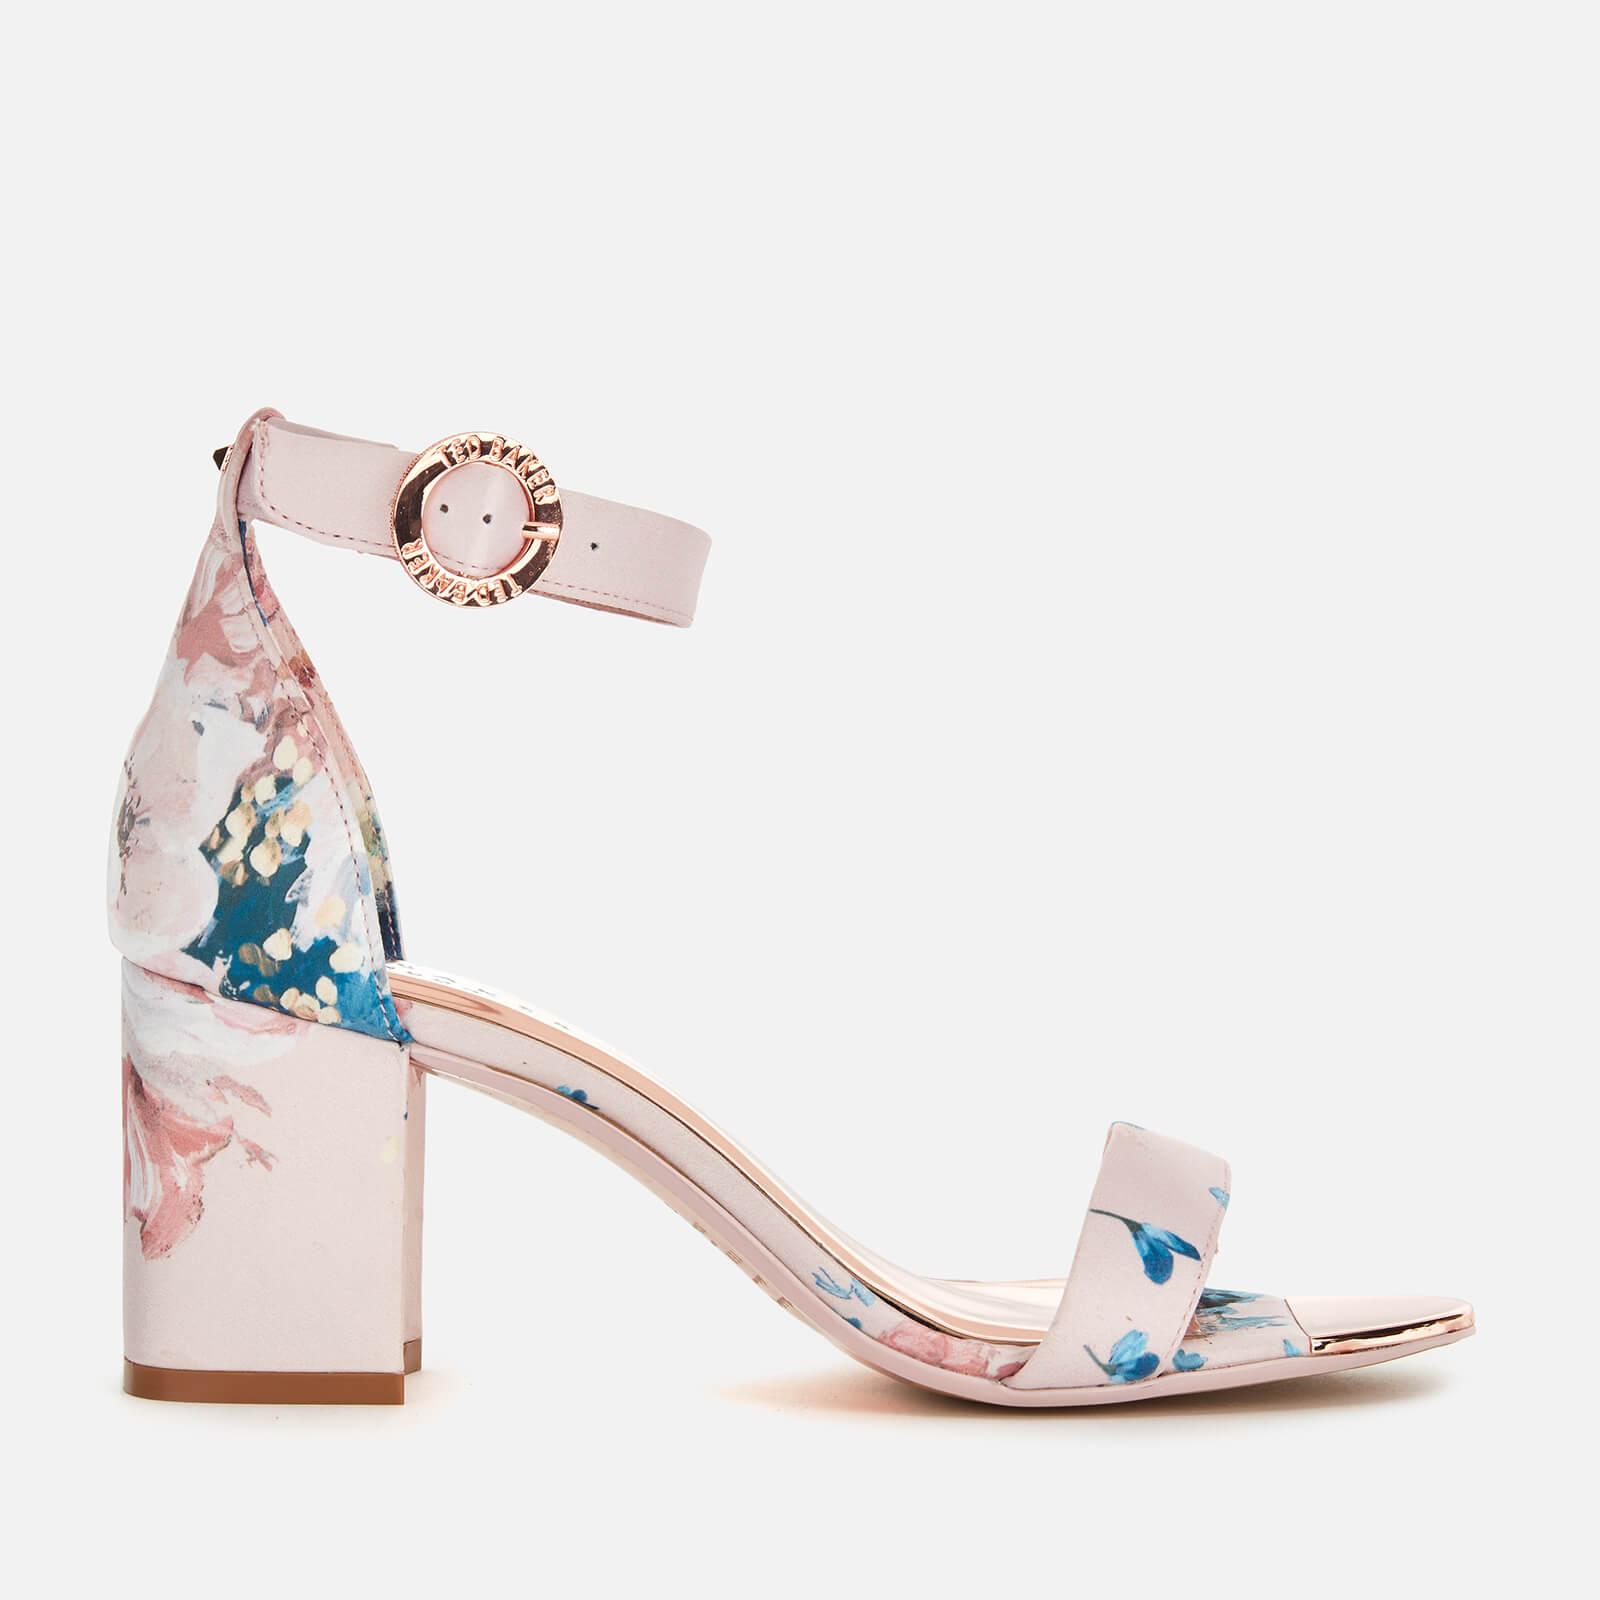 Ted Baker Women's Manyah Satin Block Heeled Sandals - Light Pink - UK 6 - Pink